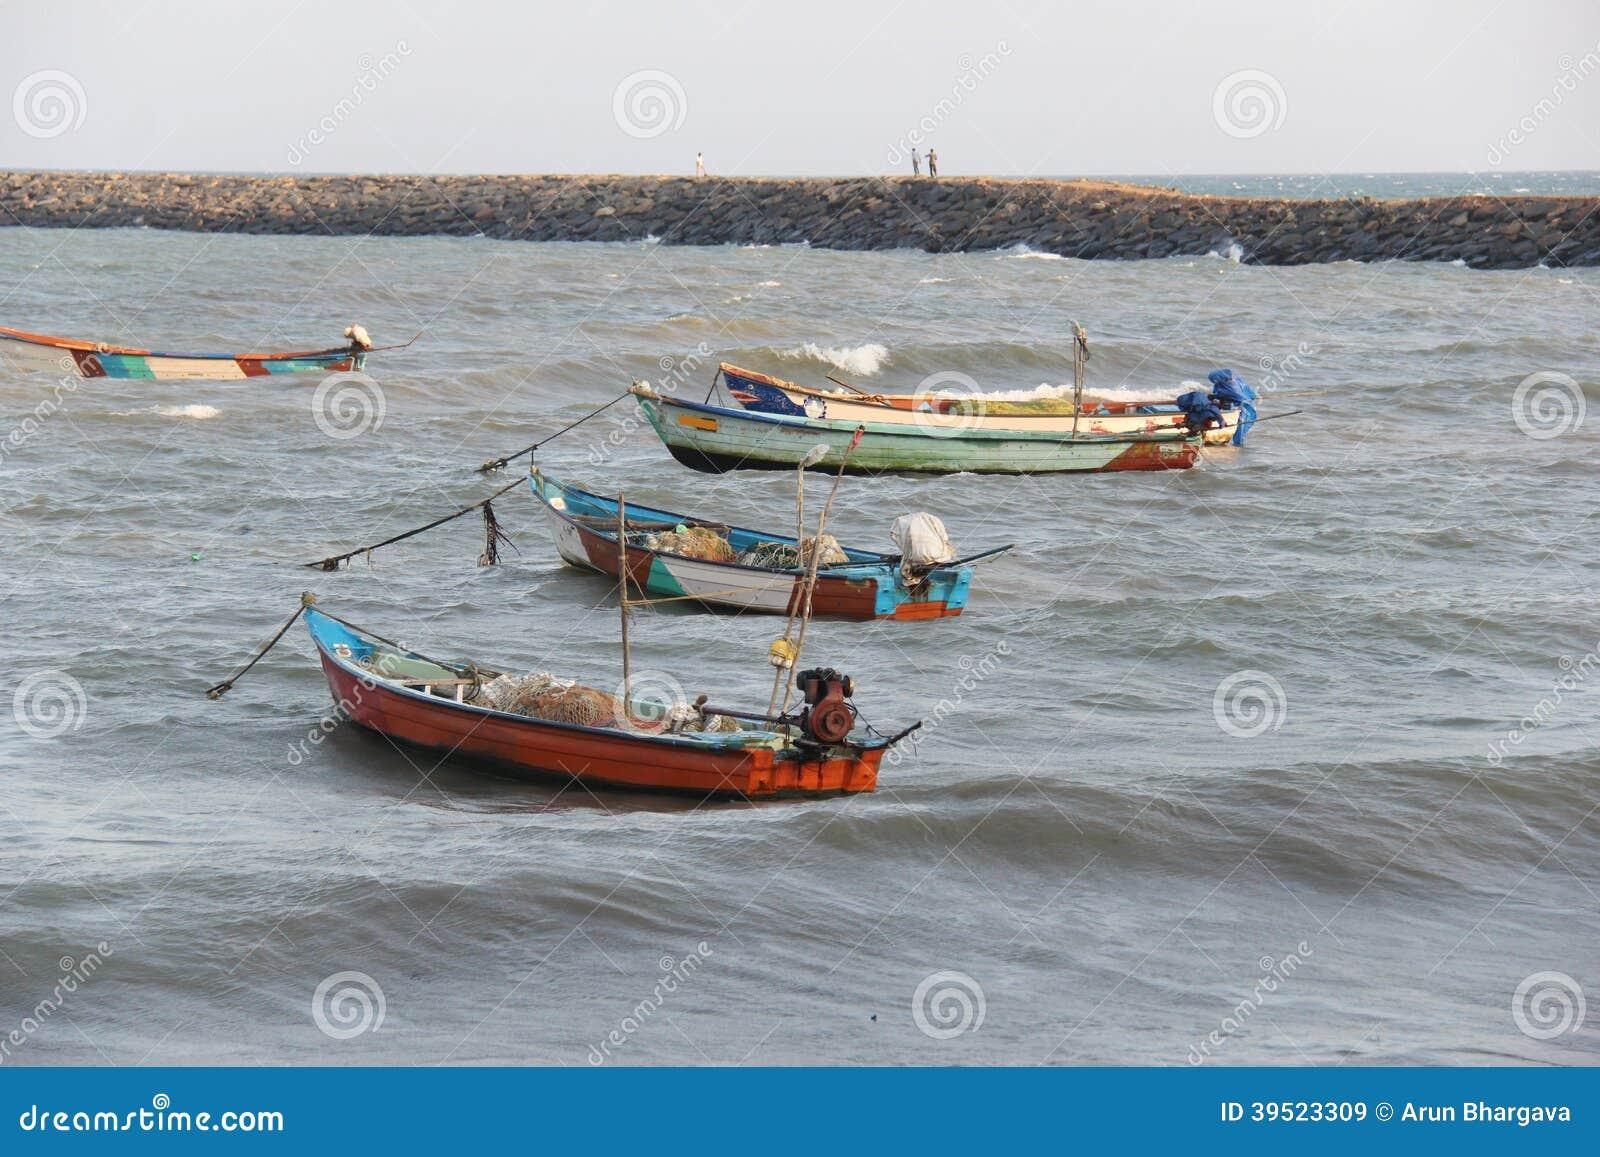 Kanyakumari fishing boats stock photo image 39523309 for Small fishing boats with motor